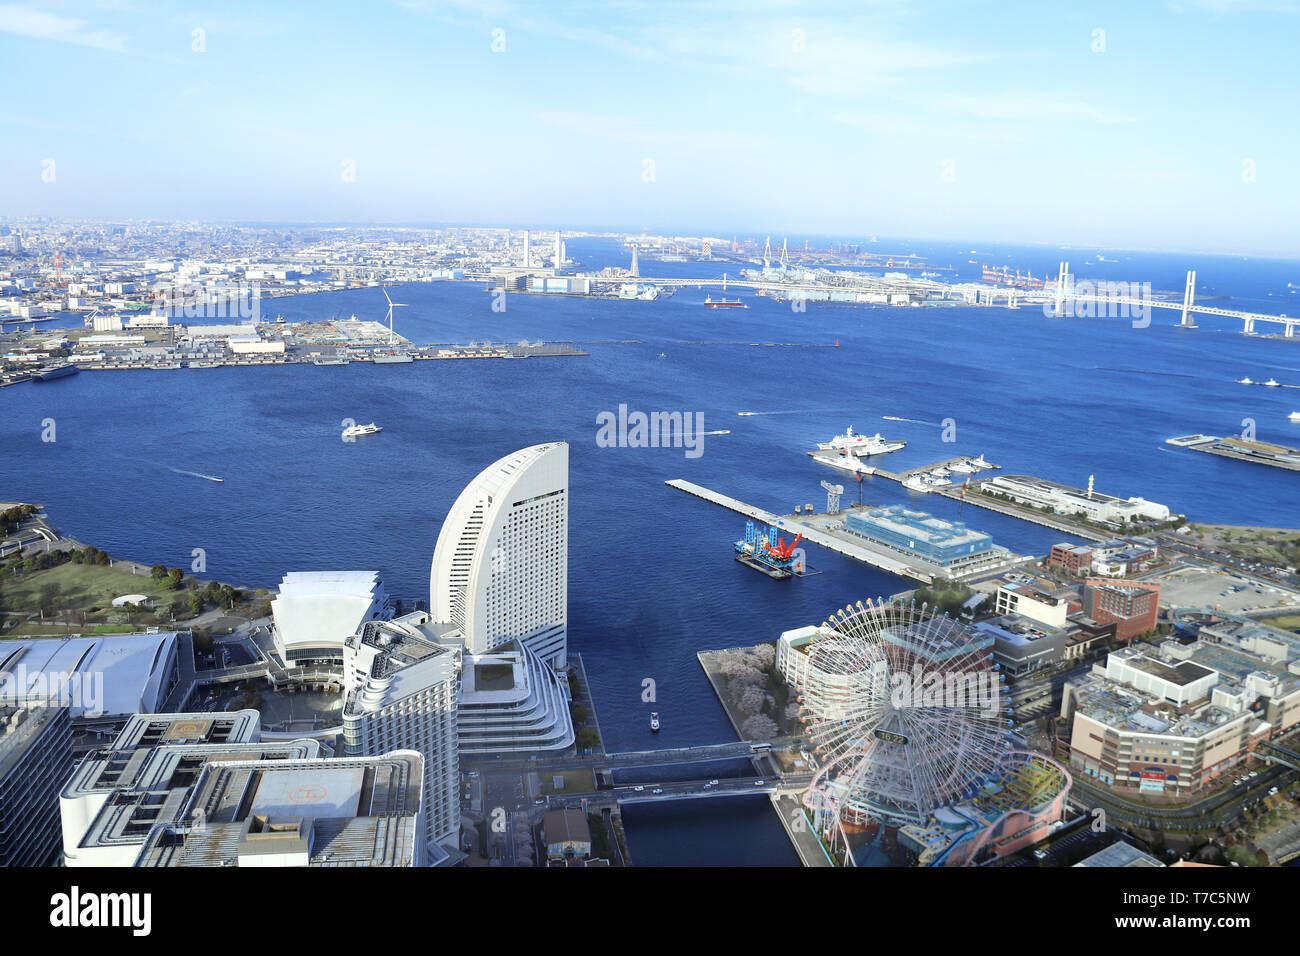 Aerial view on Yokohama and Tokyo Bay, Kanagawa prefecture, Japan - Stock Image